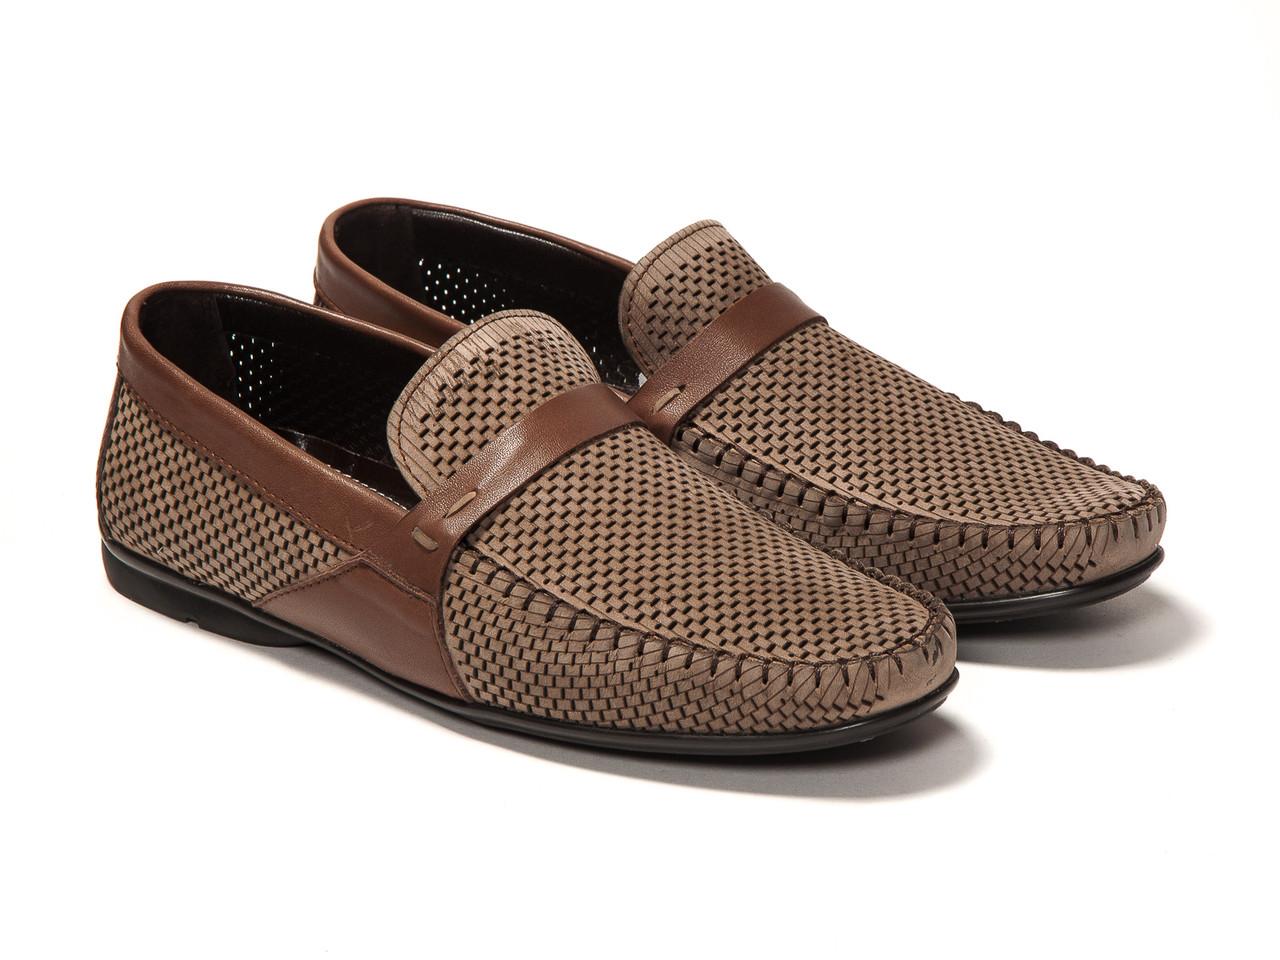 Мокасины Etor 10033-818-755-96-008 коричневые